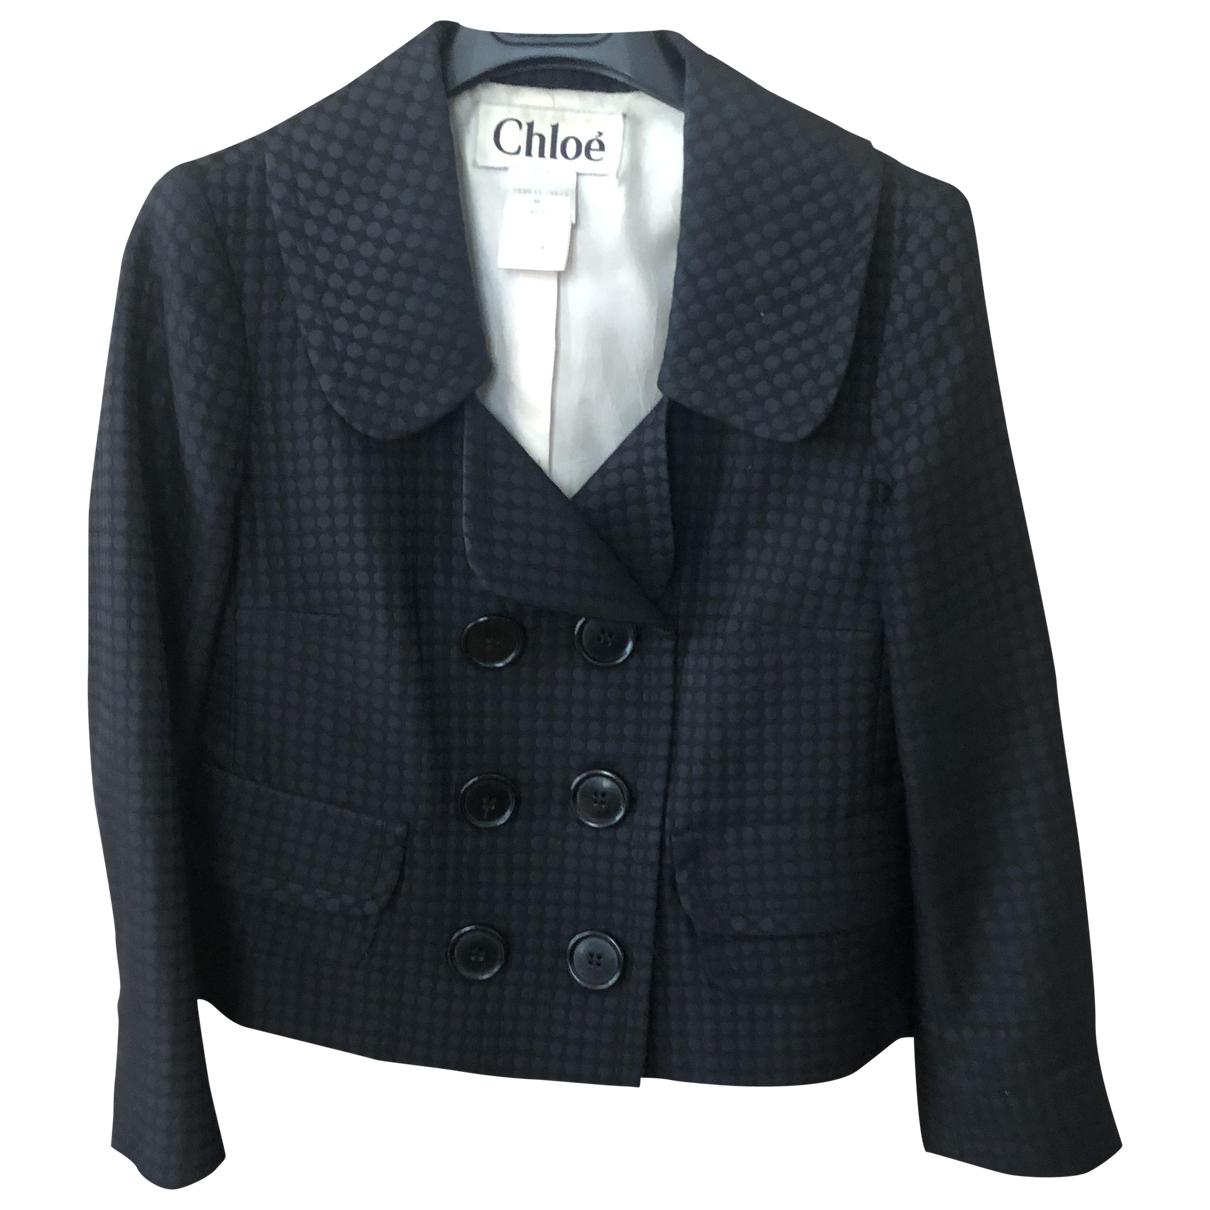 Chloé \N Black jacket for Women 36 FR